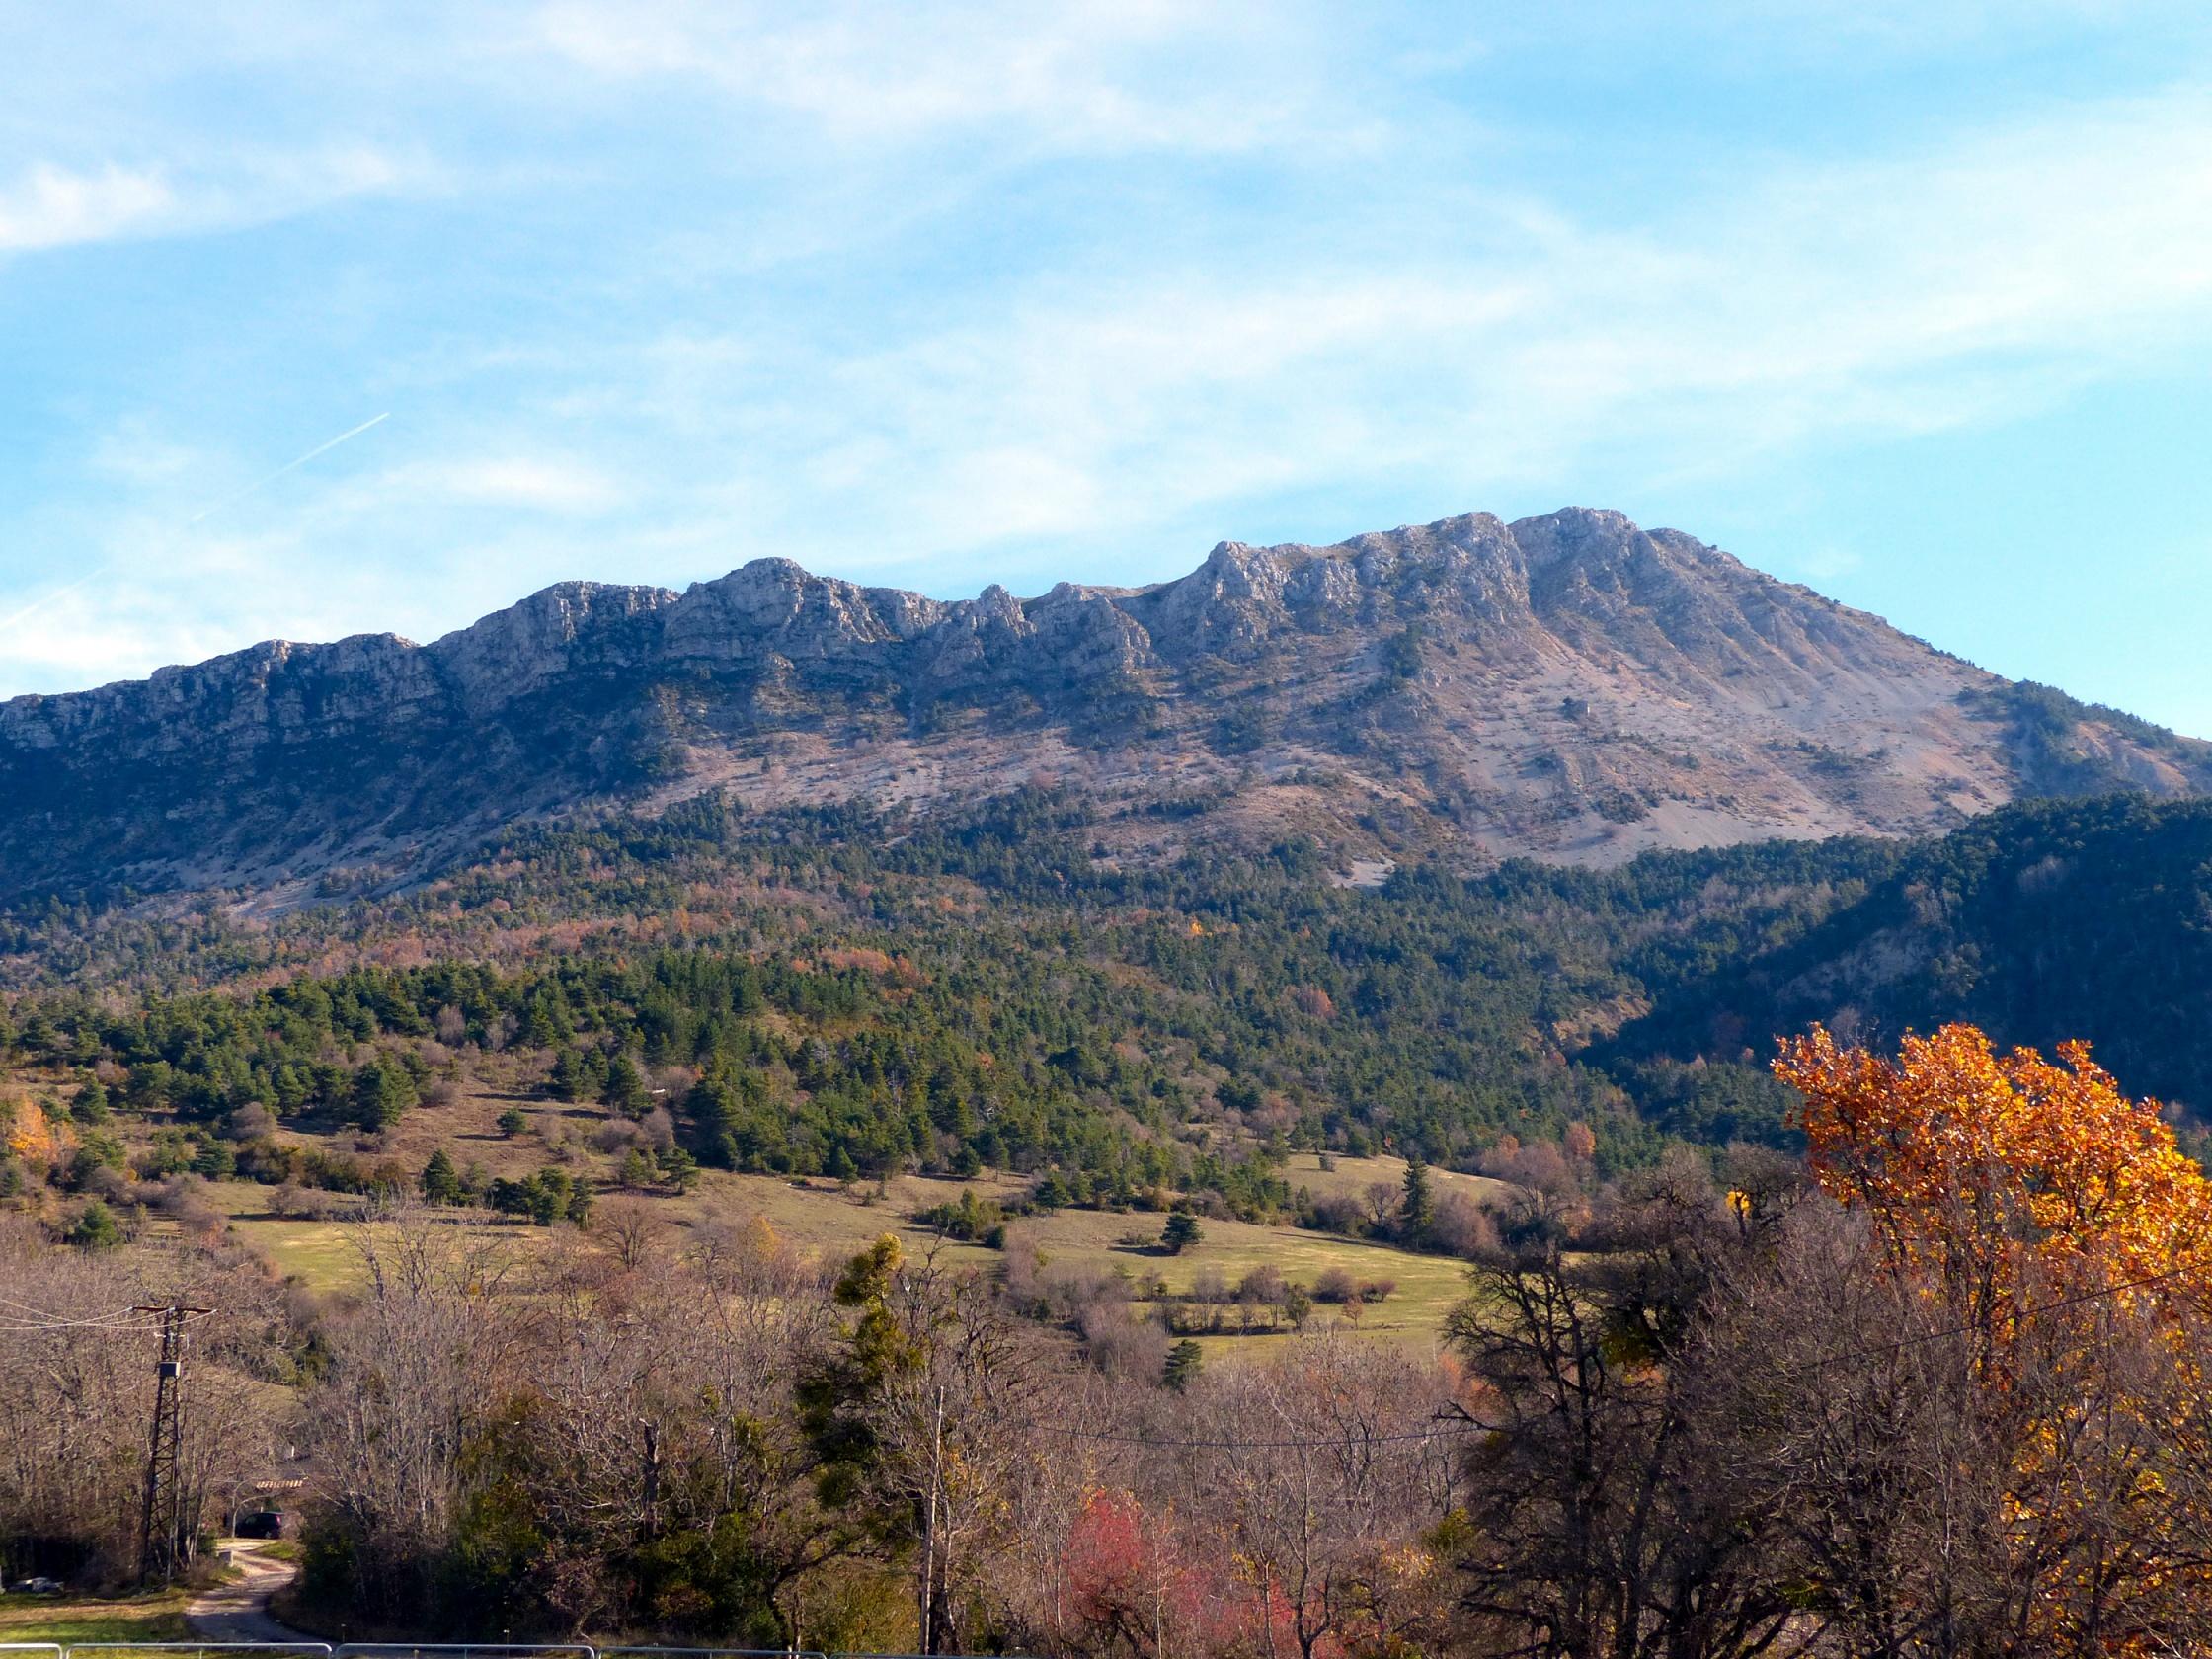 http://ekladata.com/yGIluU6C0HE58yD7eTiJeY3miPI/blieux-2015-paysage-montagneux.jpg